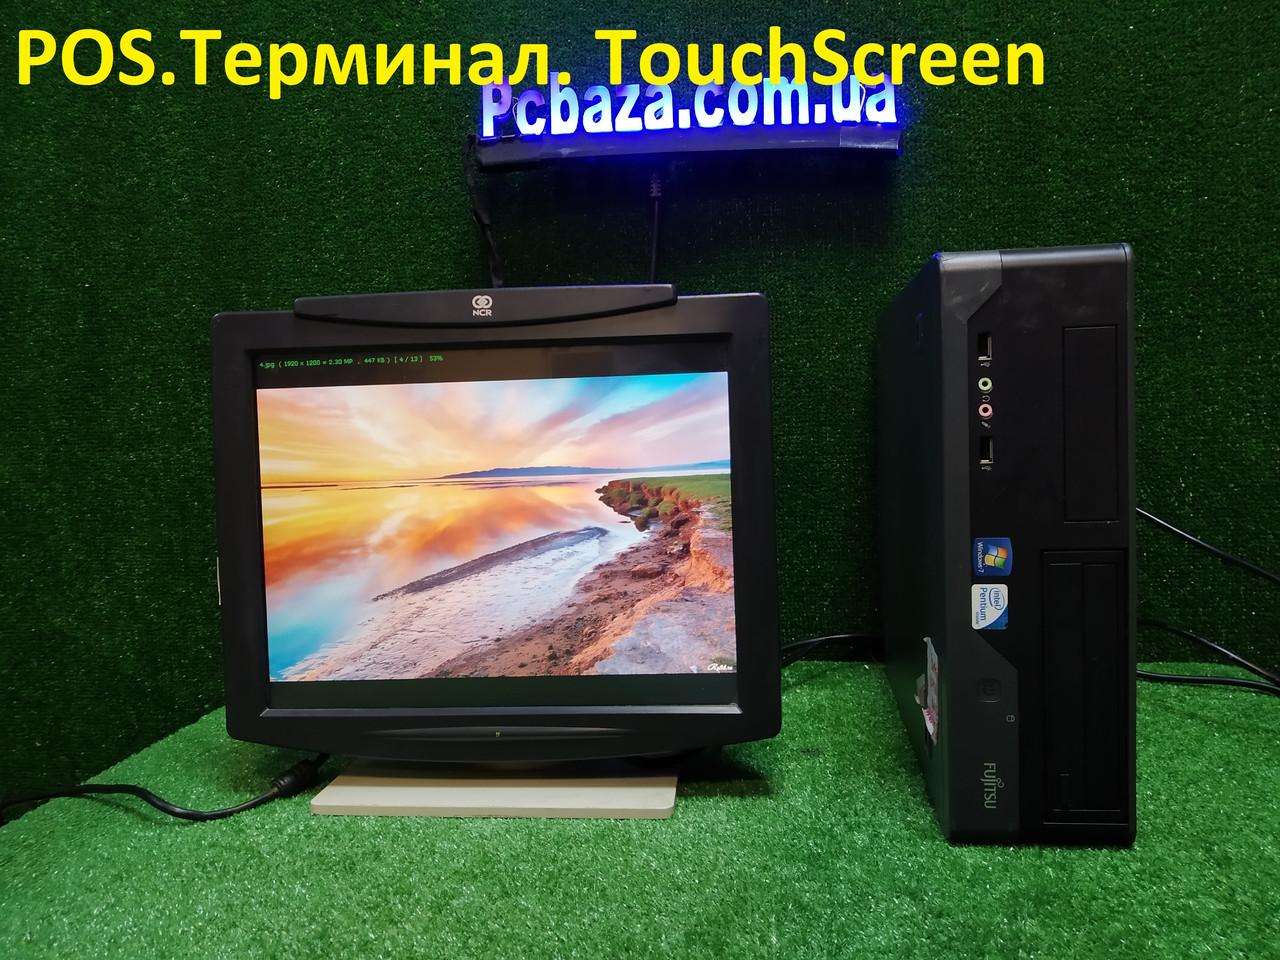 "POS Торговый терминал Fujitsu\4 ядра\4gb\ + 15"" Touchscreen"